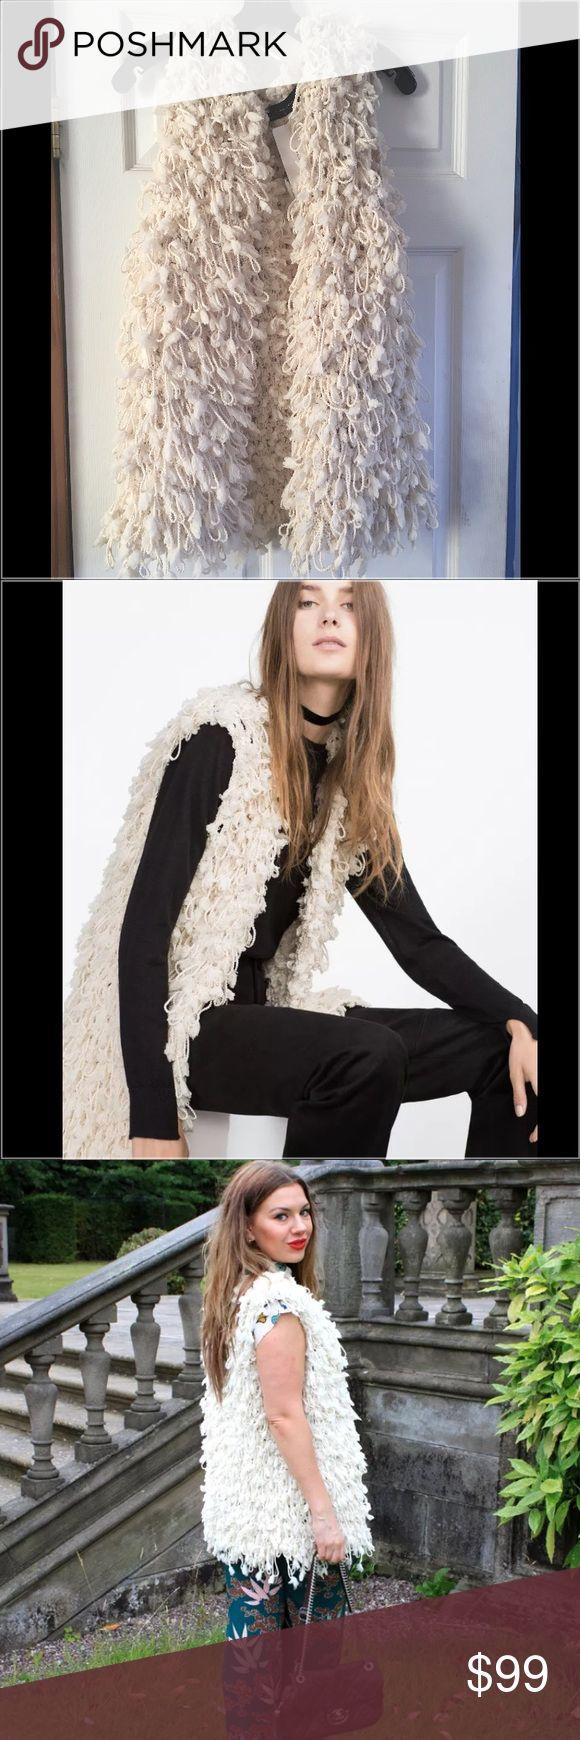 Zara Ecru Cream Braided Waistcoat Vest Jacket ZARA  Sophisticated Fancy Waist Coat  A Great Upgrade to Any Wardrobe  Size: M  Color: Ecru/ Cream Zara Jackets & Coats